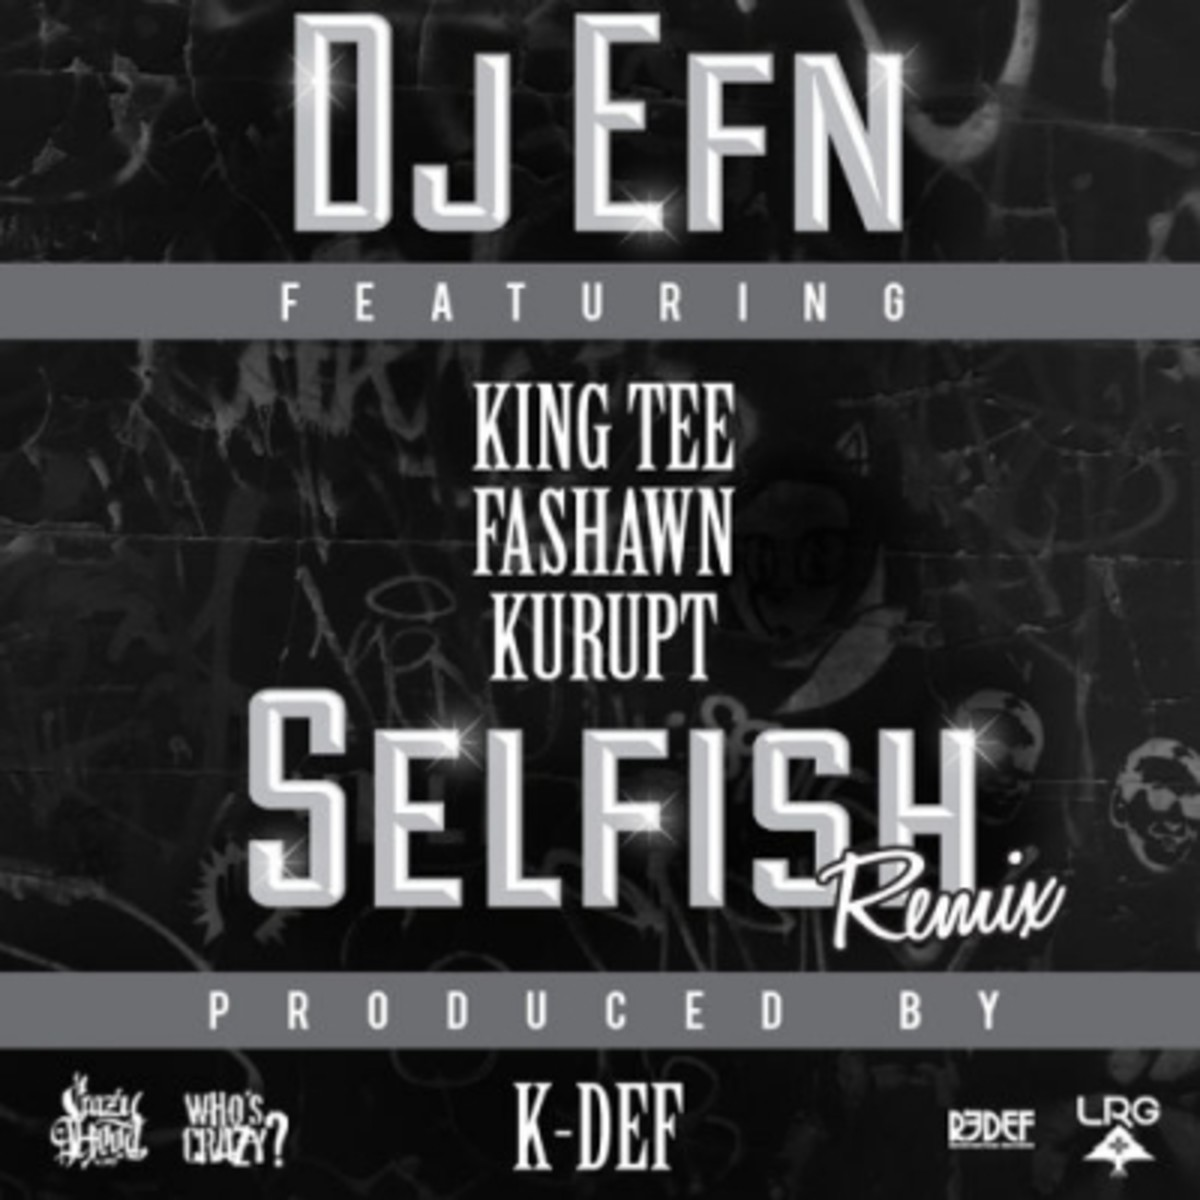 dj-efn-selfish-k-def-remix.jpg